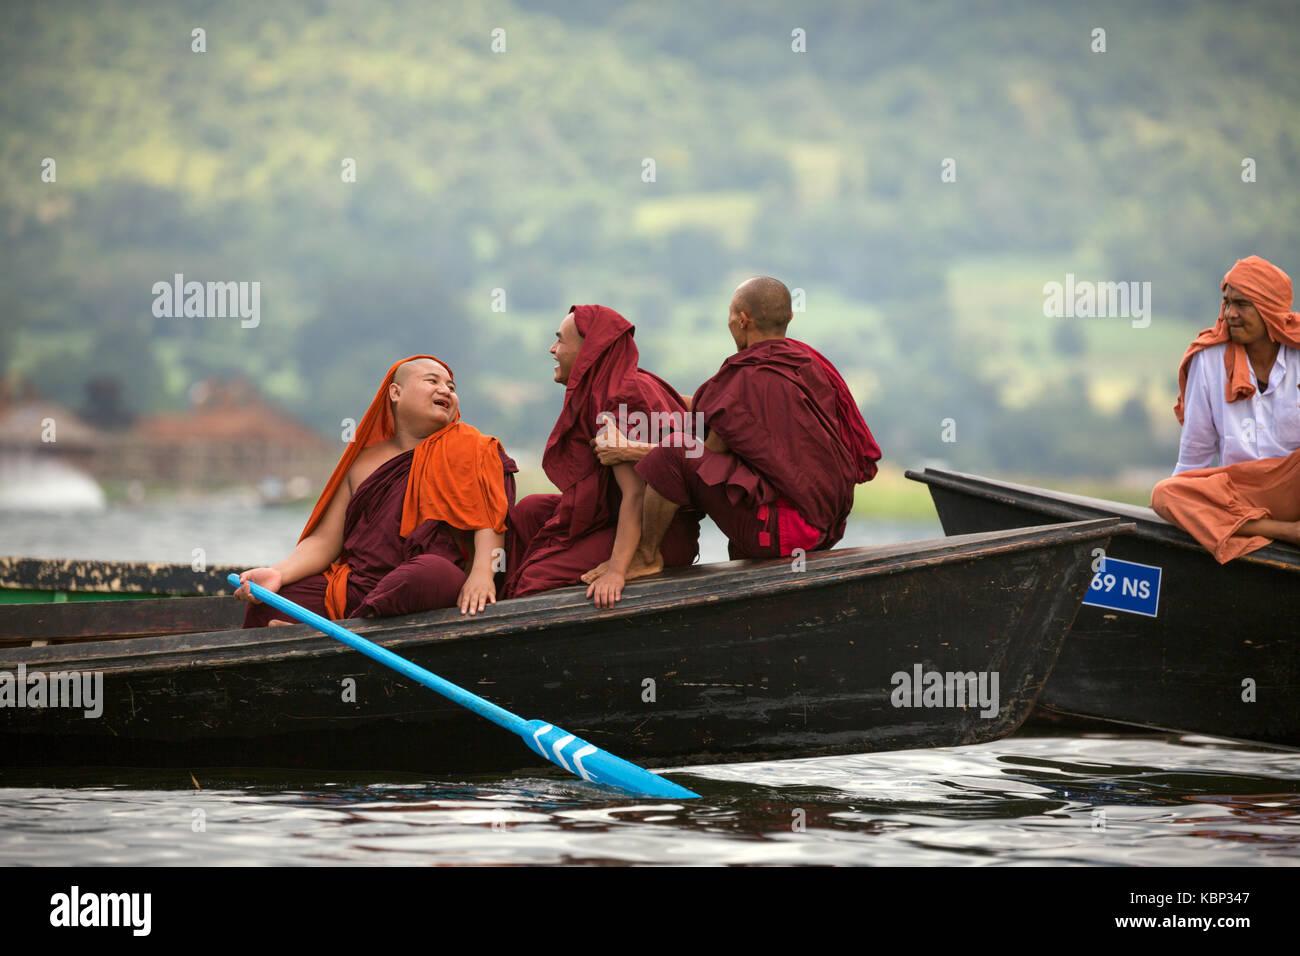 Asien, Myanmar, Shen, Inle See, Boat Race Wettbewerb beim Phaung Daw Oo Pagode Festival, Inn Kaung Dorf, lokale Stockbild